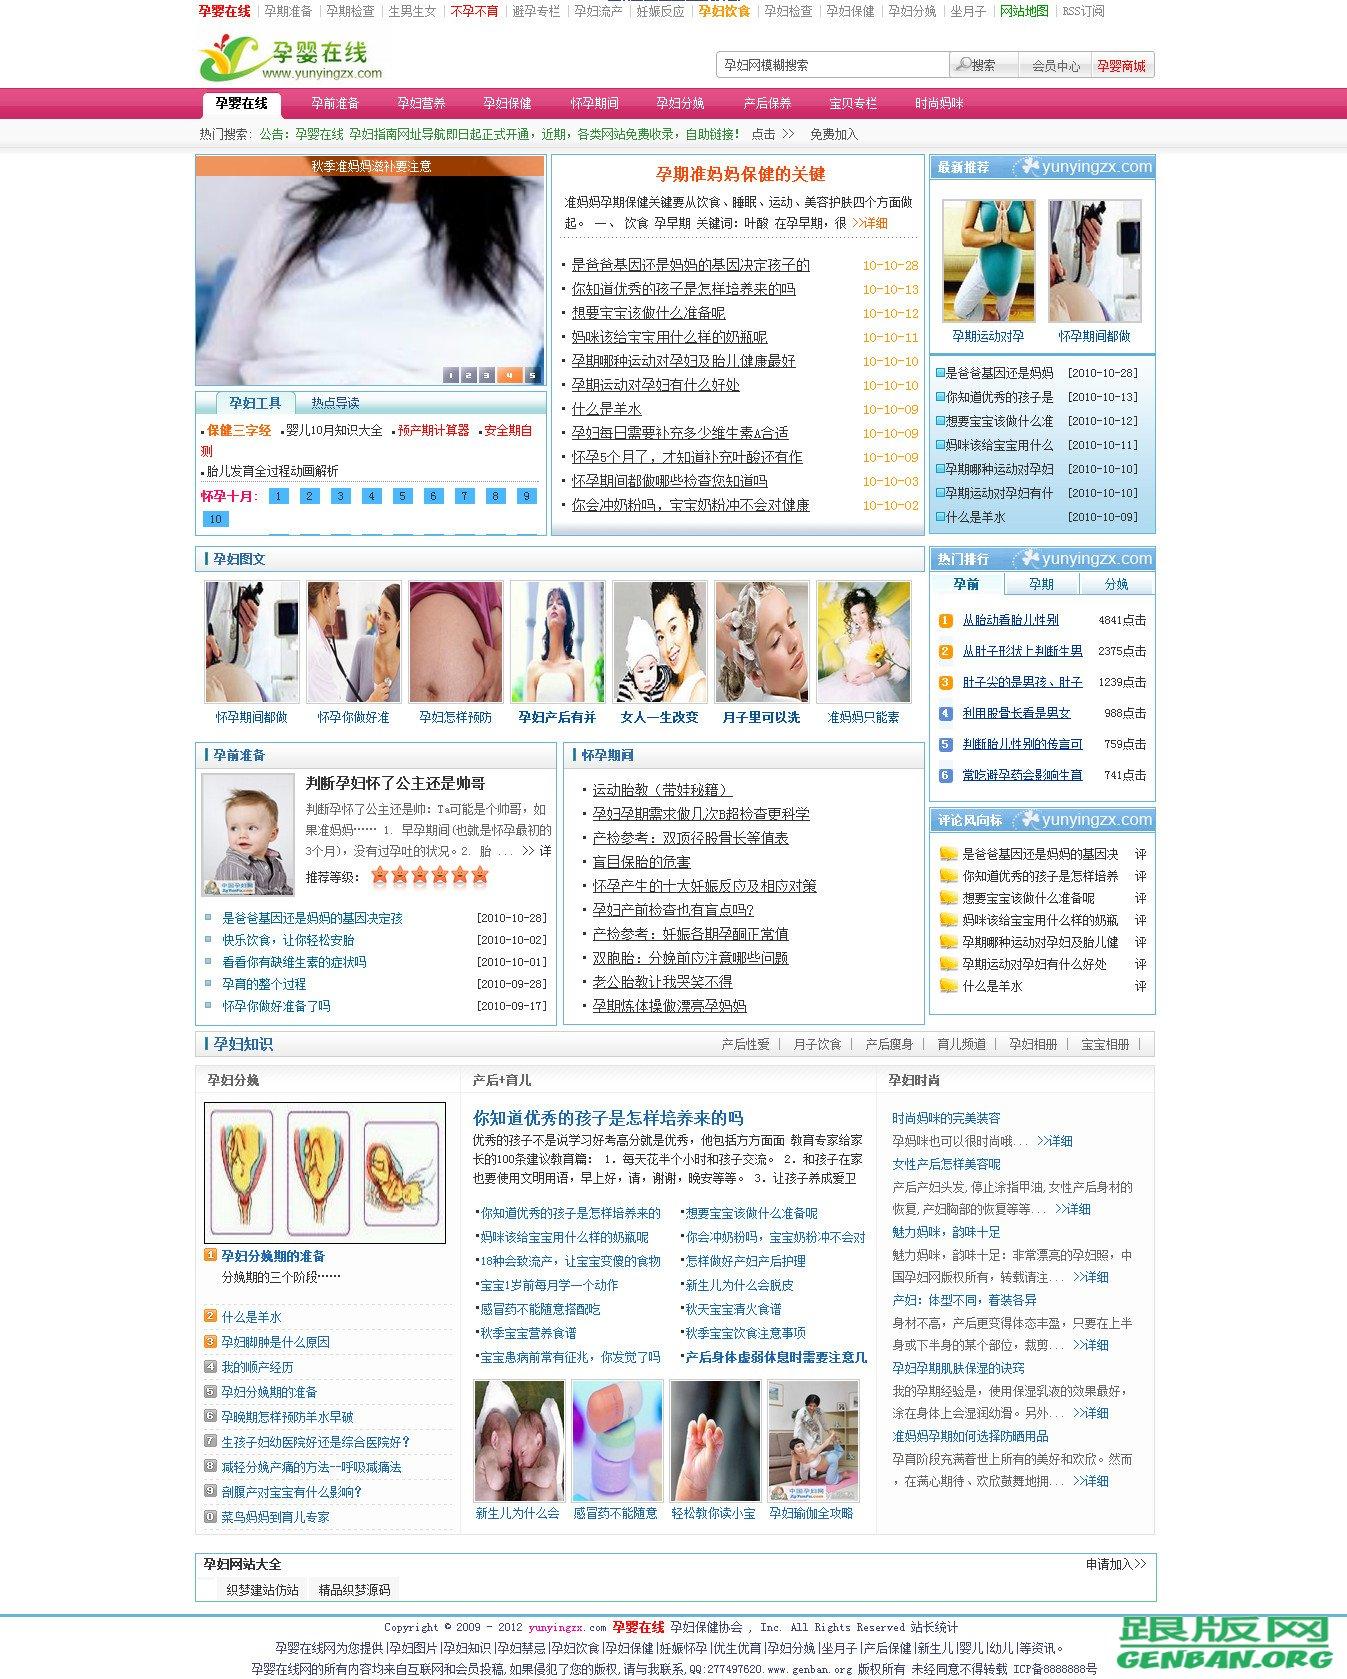 dedecms孕婴在线_孕妇资讯网站源码